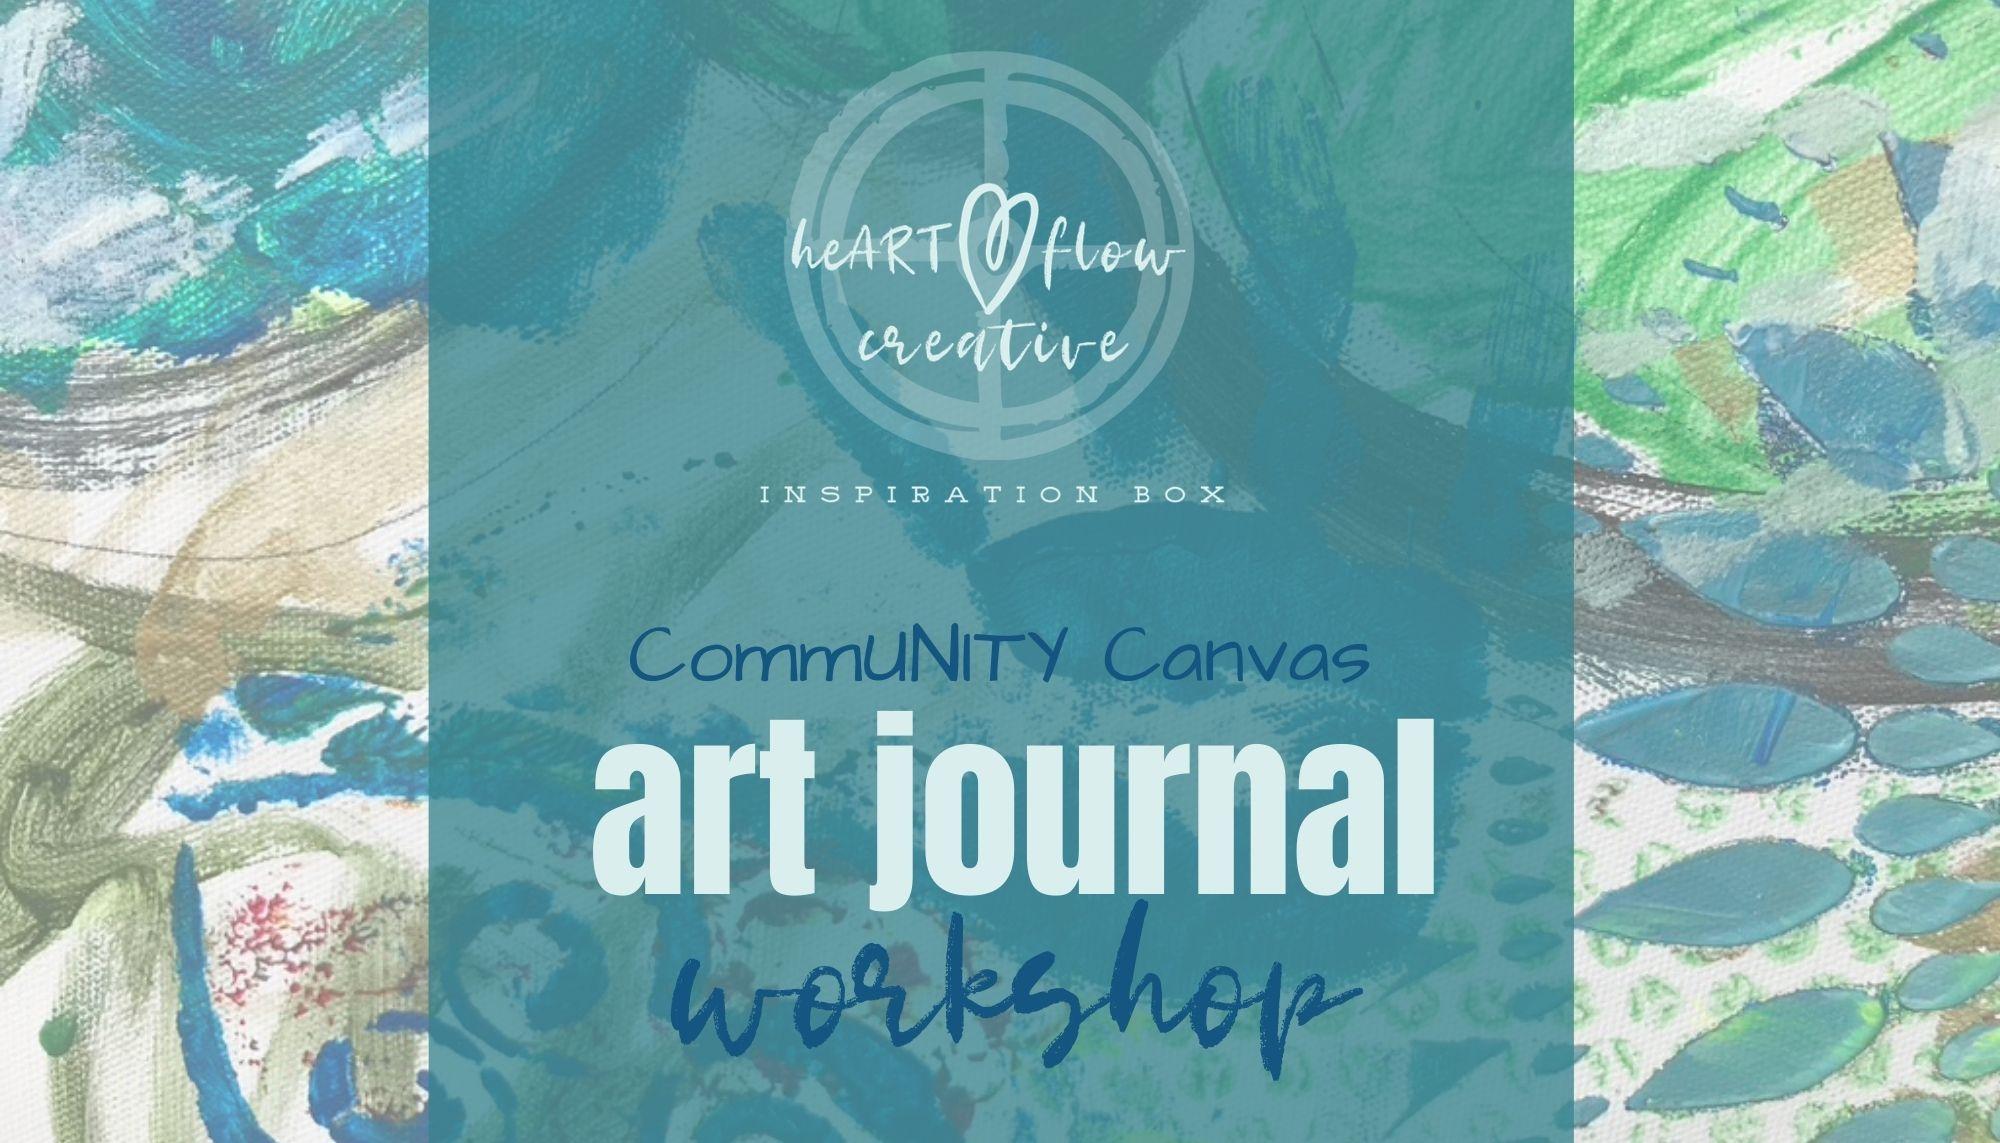 heARTflow Creative Inspiration Box:  CommUNITY Canvas Zen Journal